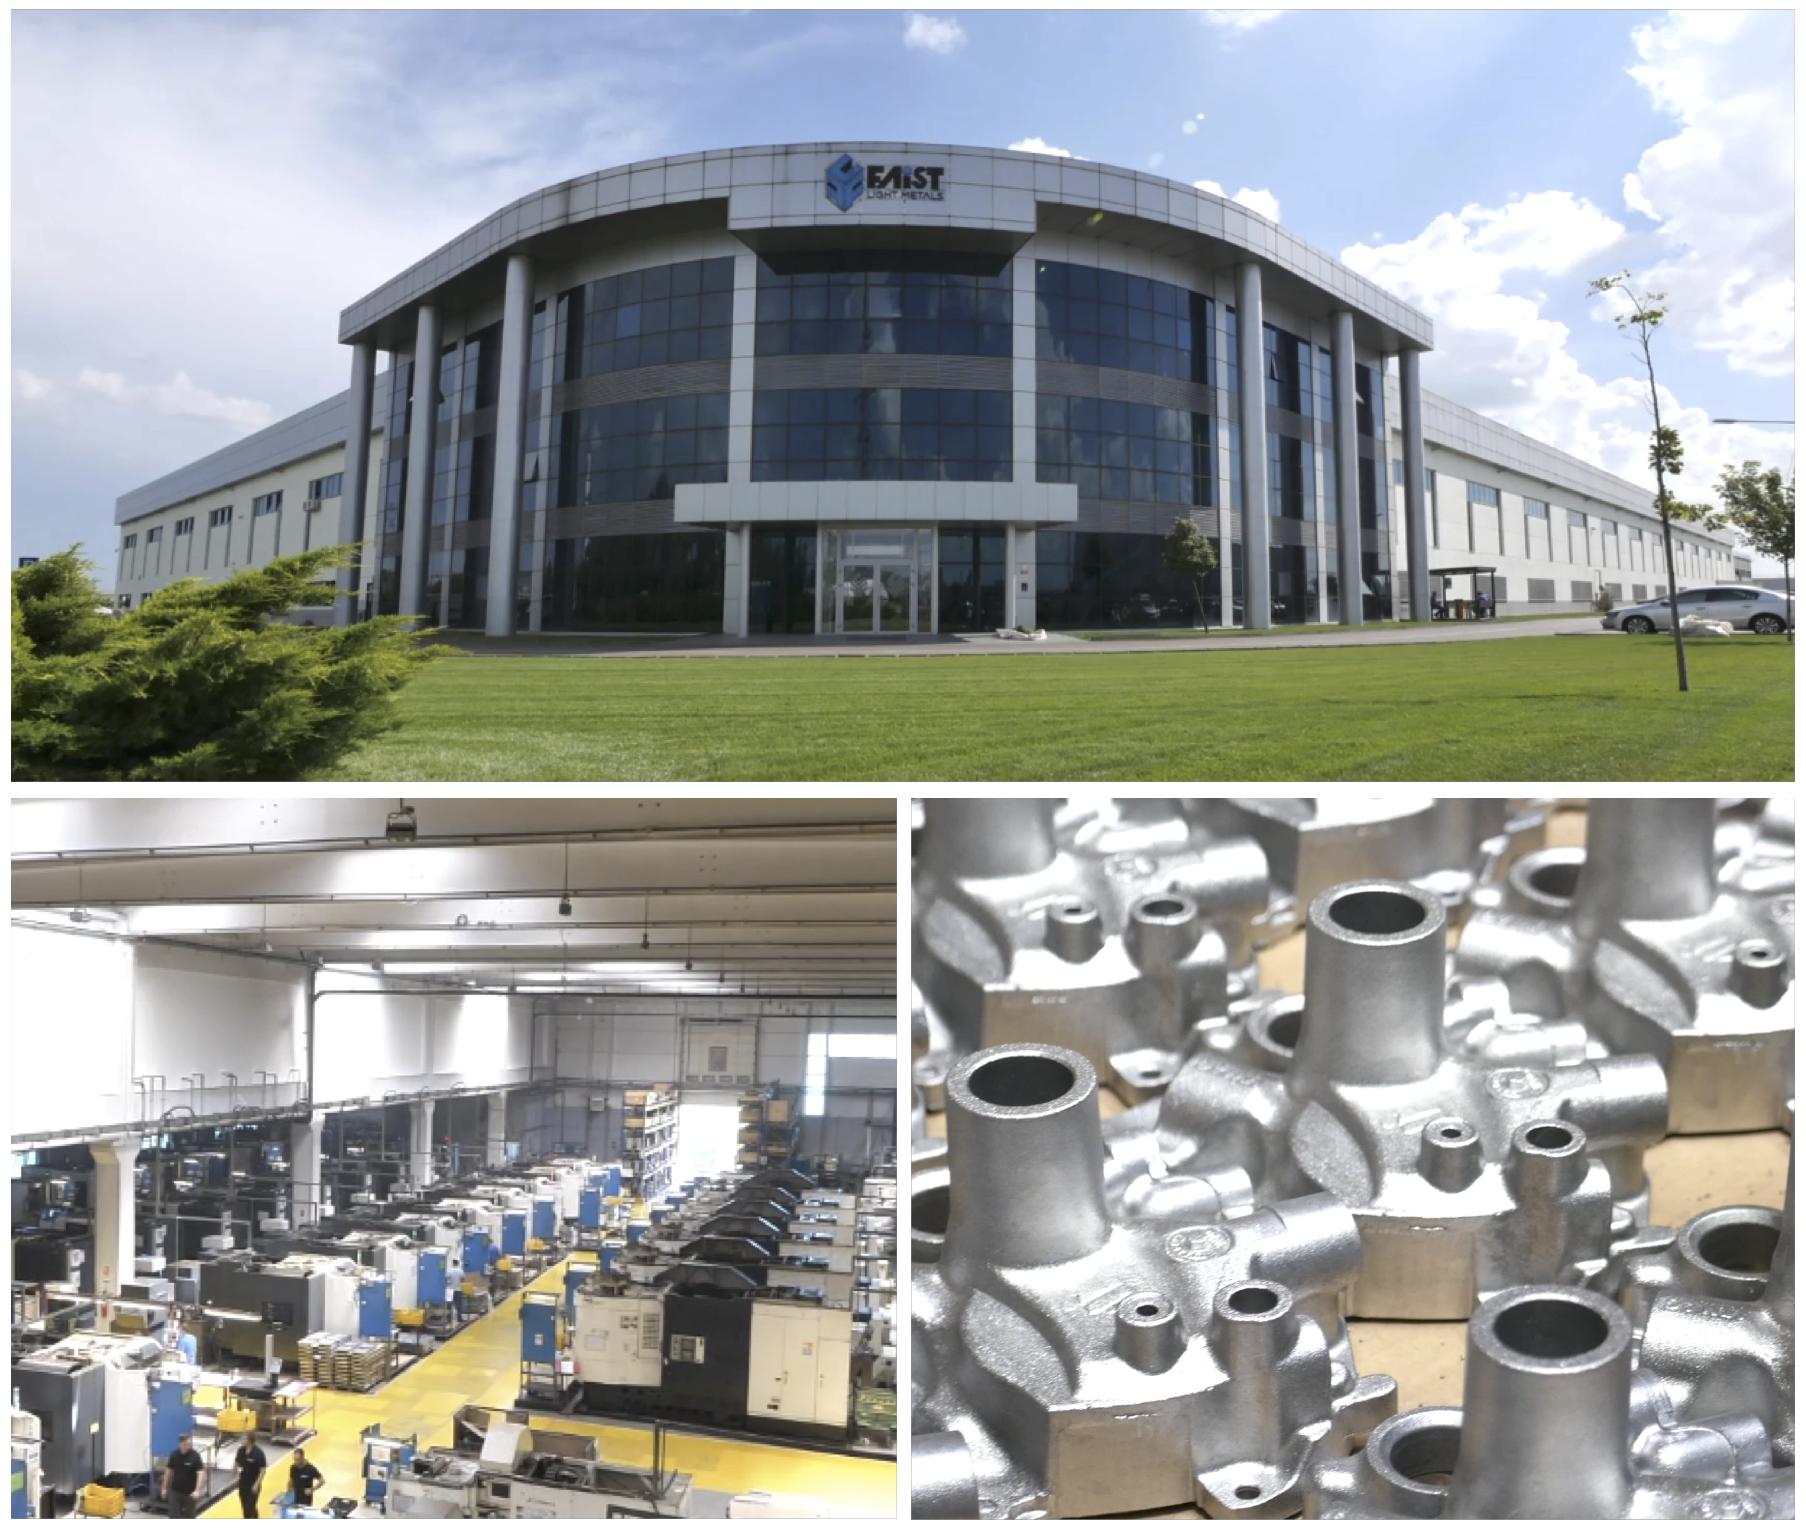 NX CAD, NX CAM, Digitalizare productie, Digital Twin, Siemens, Faist, Oradea